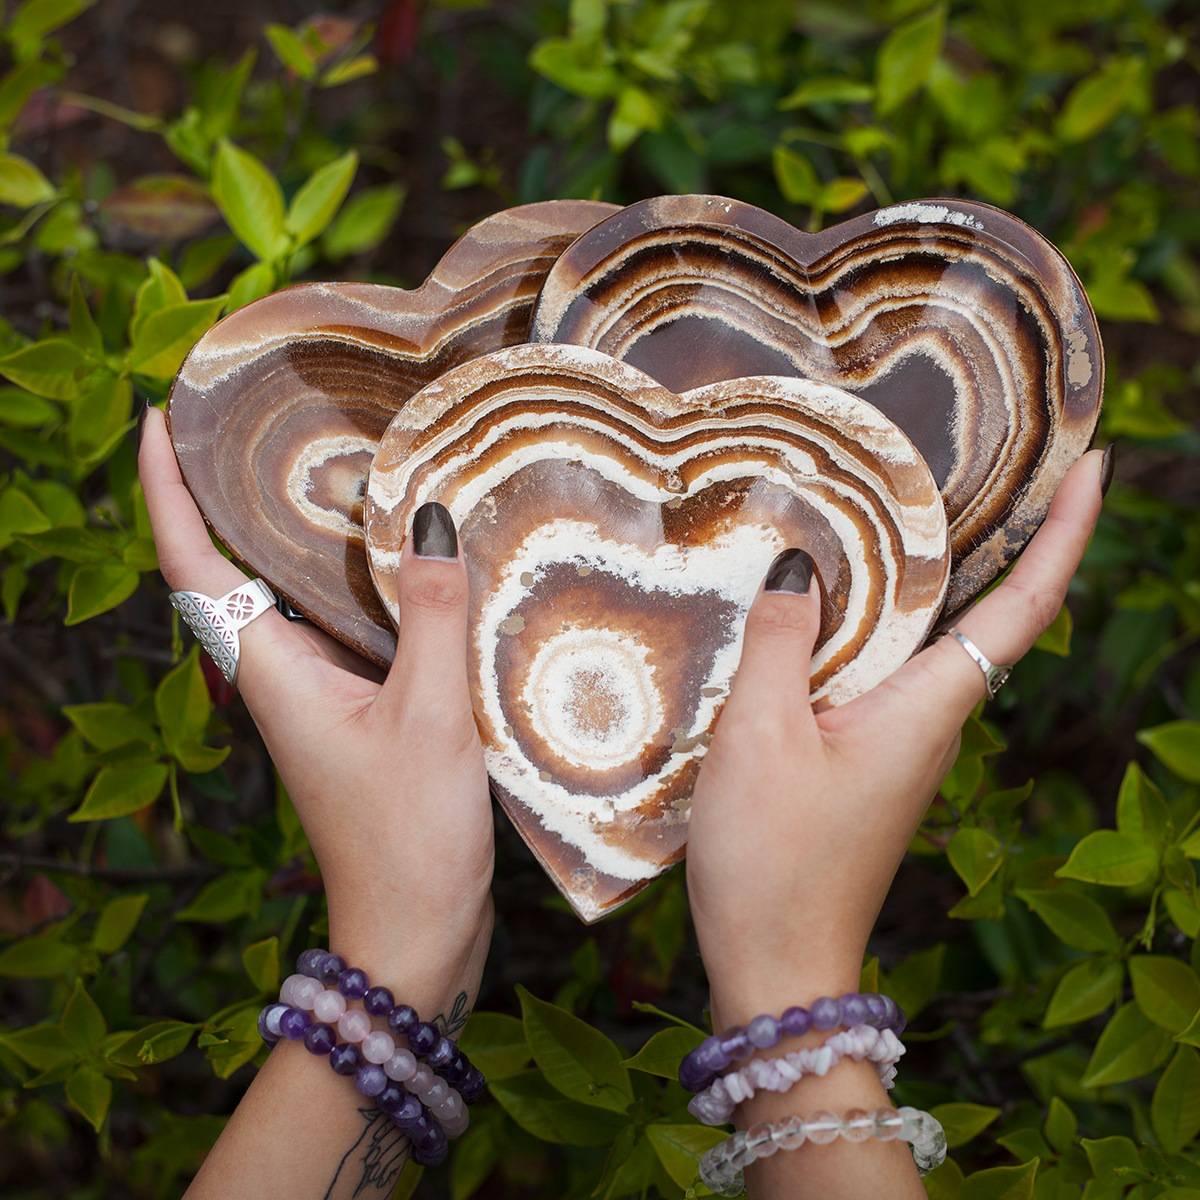 Peaceful Heart Plates 4_11